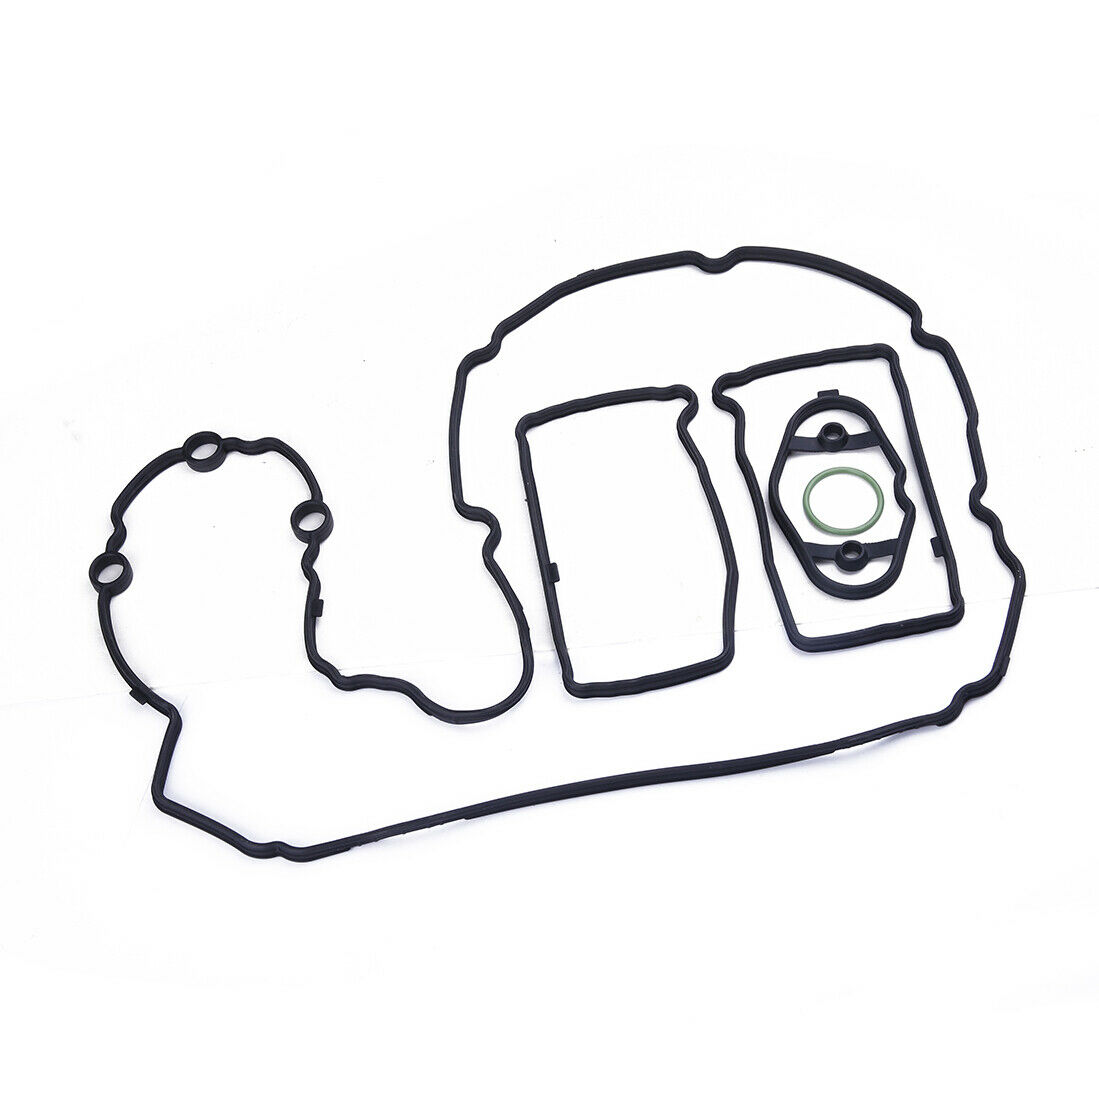 1 SET Valve Cover Gasket for BMW X1 F10 F11 F25 X3 F20 F30